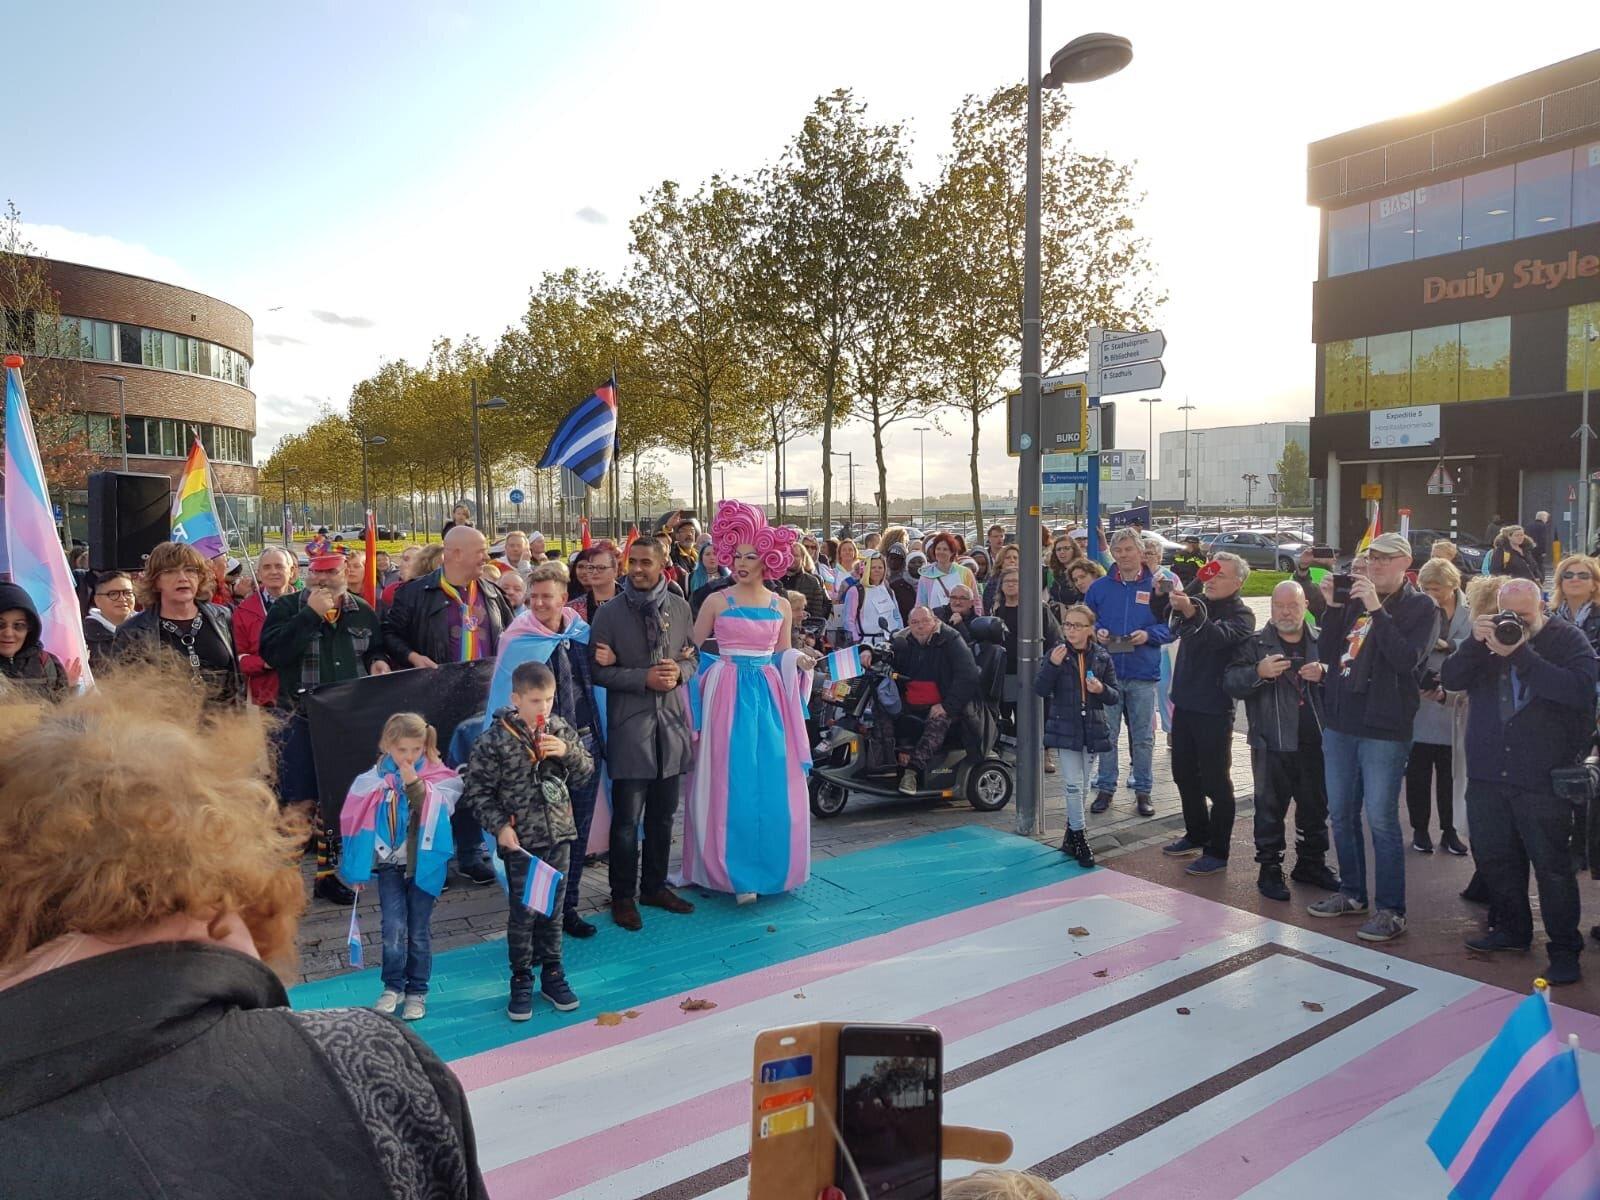 """Enorme rijkdom"": Almere neemt ""transgenderzebrapad"" in gebruik"